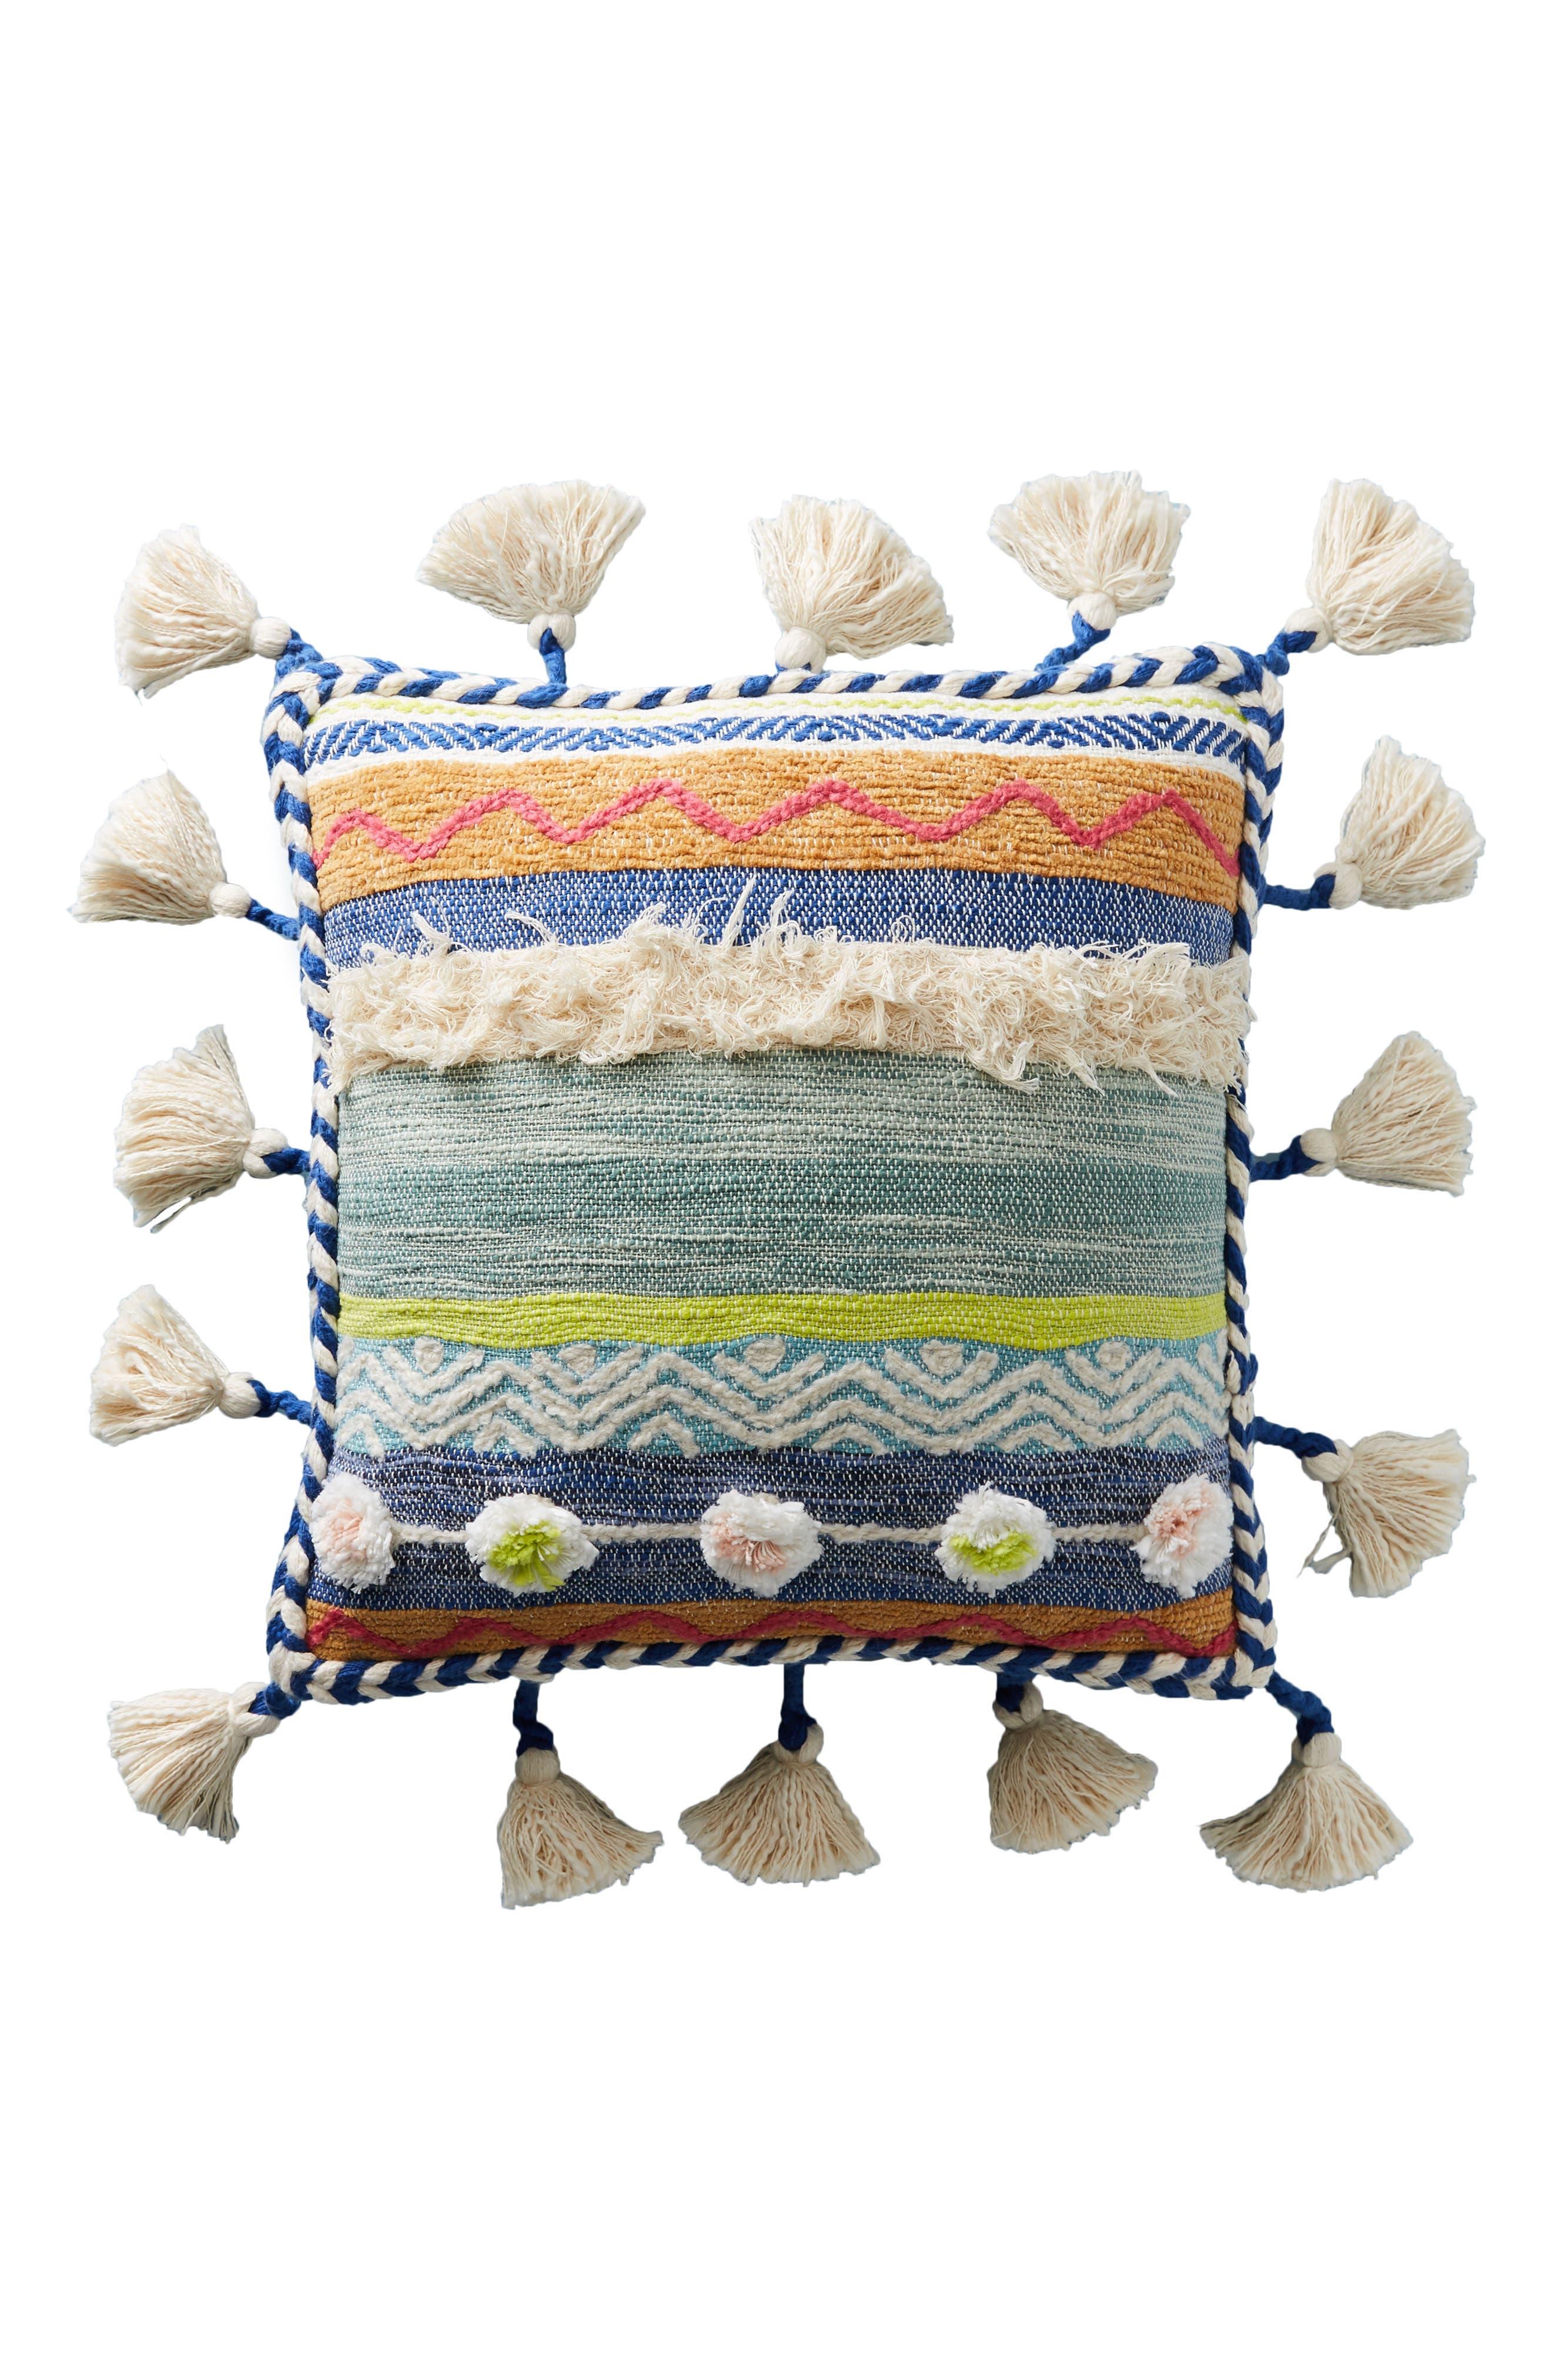 Woven Rami Accent Pillow,                             Alternate thumbnail 6, color,                             Blue Combo